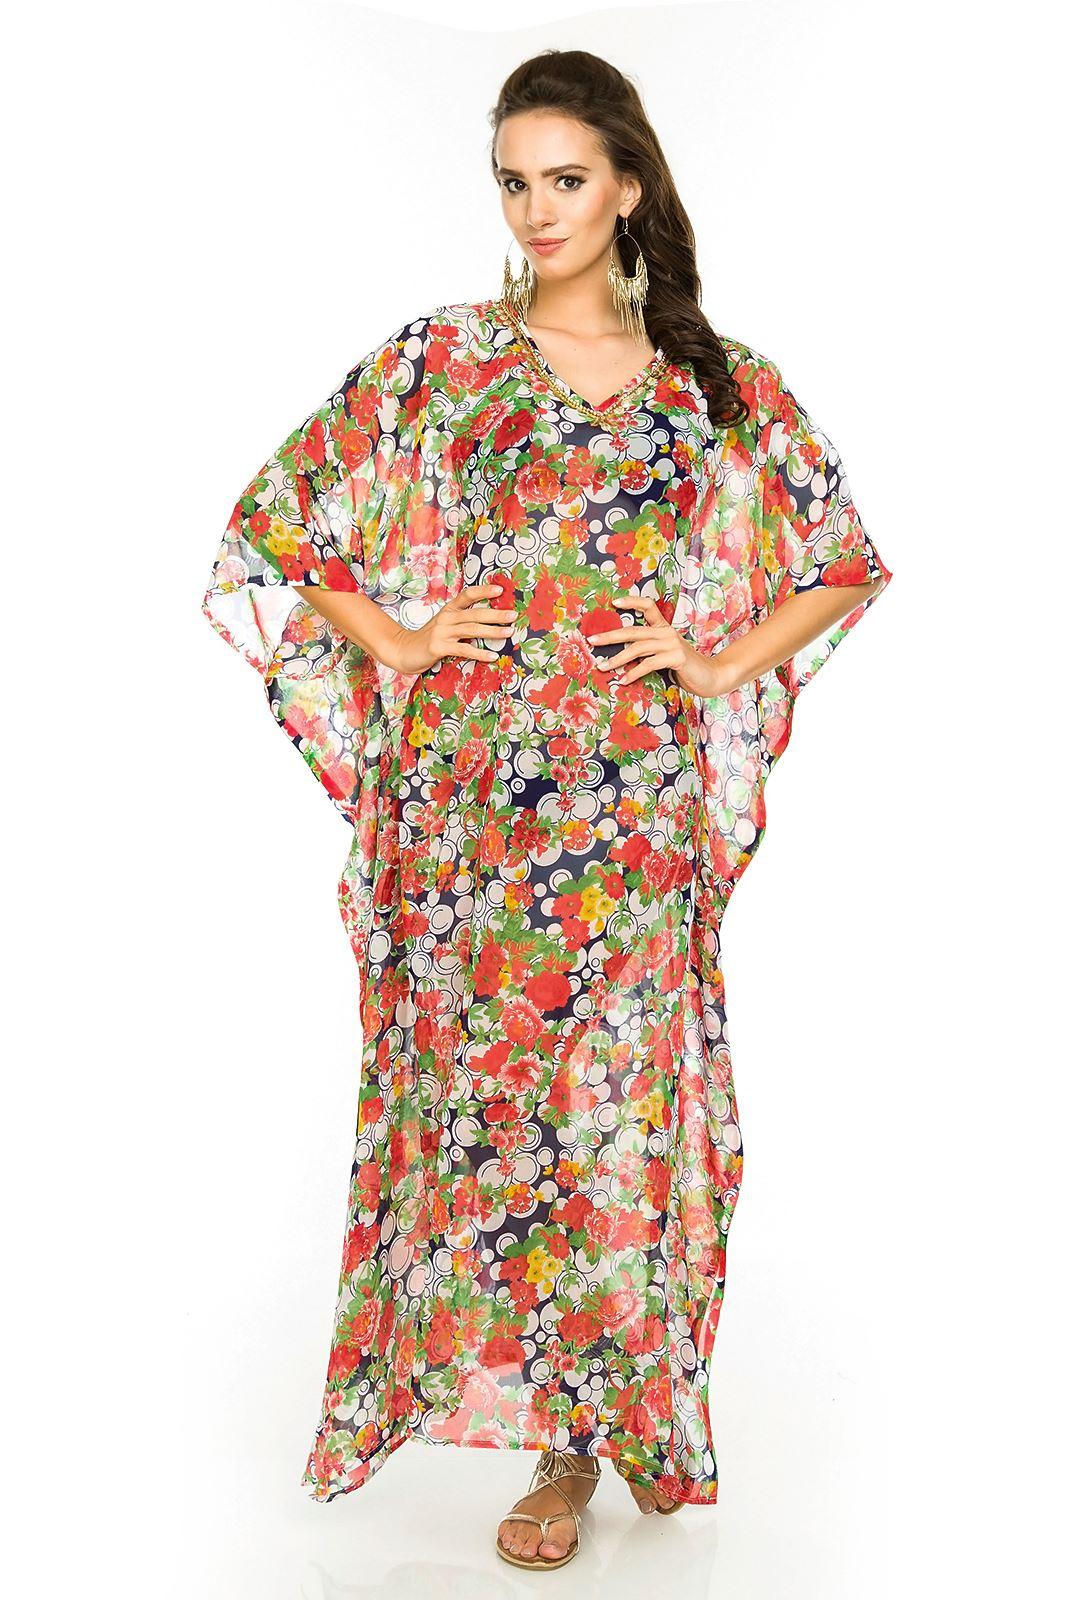 femmes longue kimono maxi t plage couette caftan robe taille 10 26 ebay. Black Bedroom Furniture Sets. Home Design Ideas